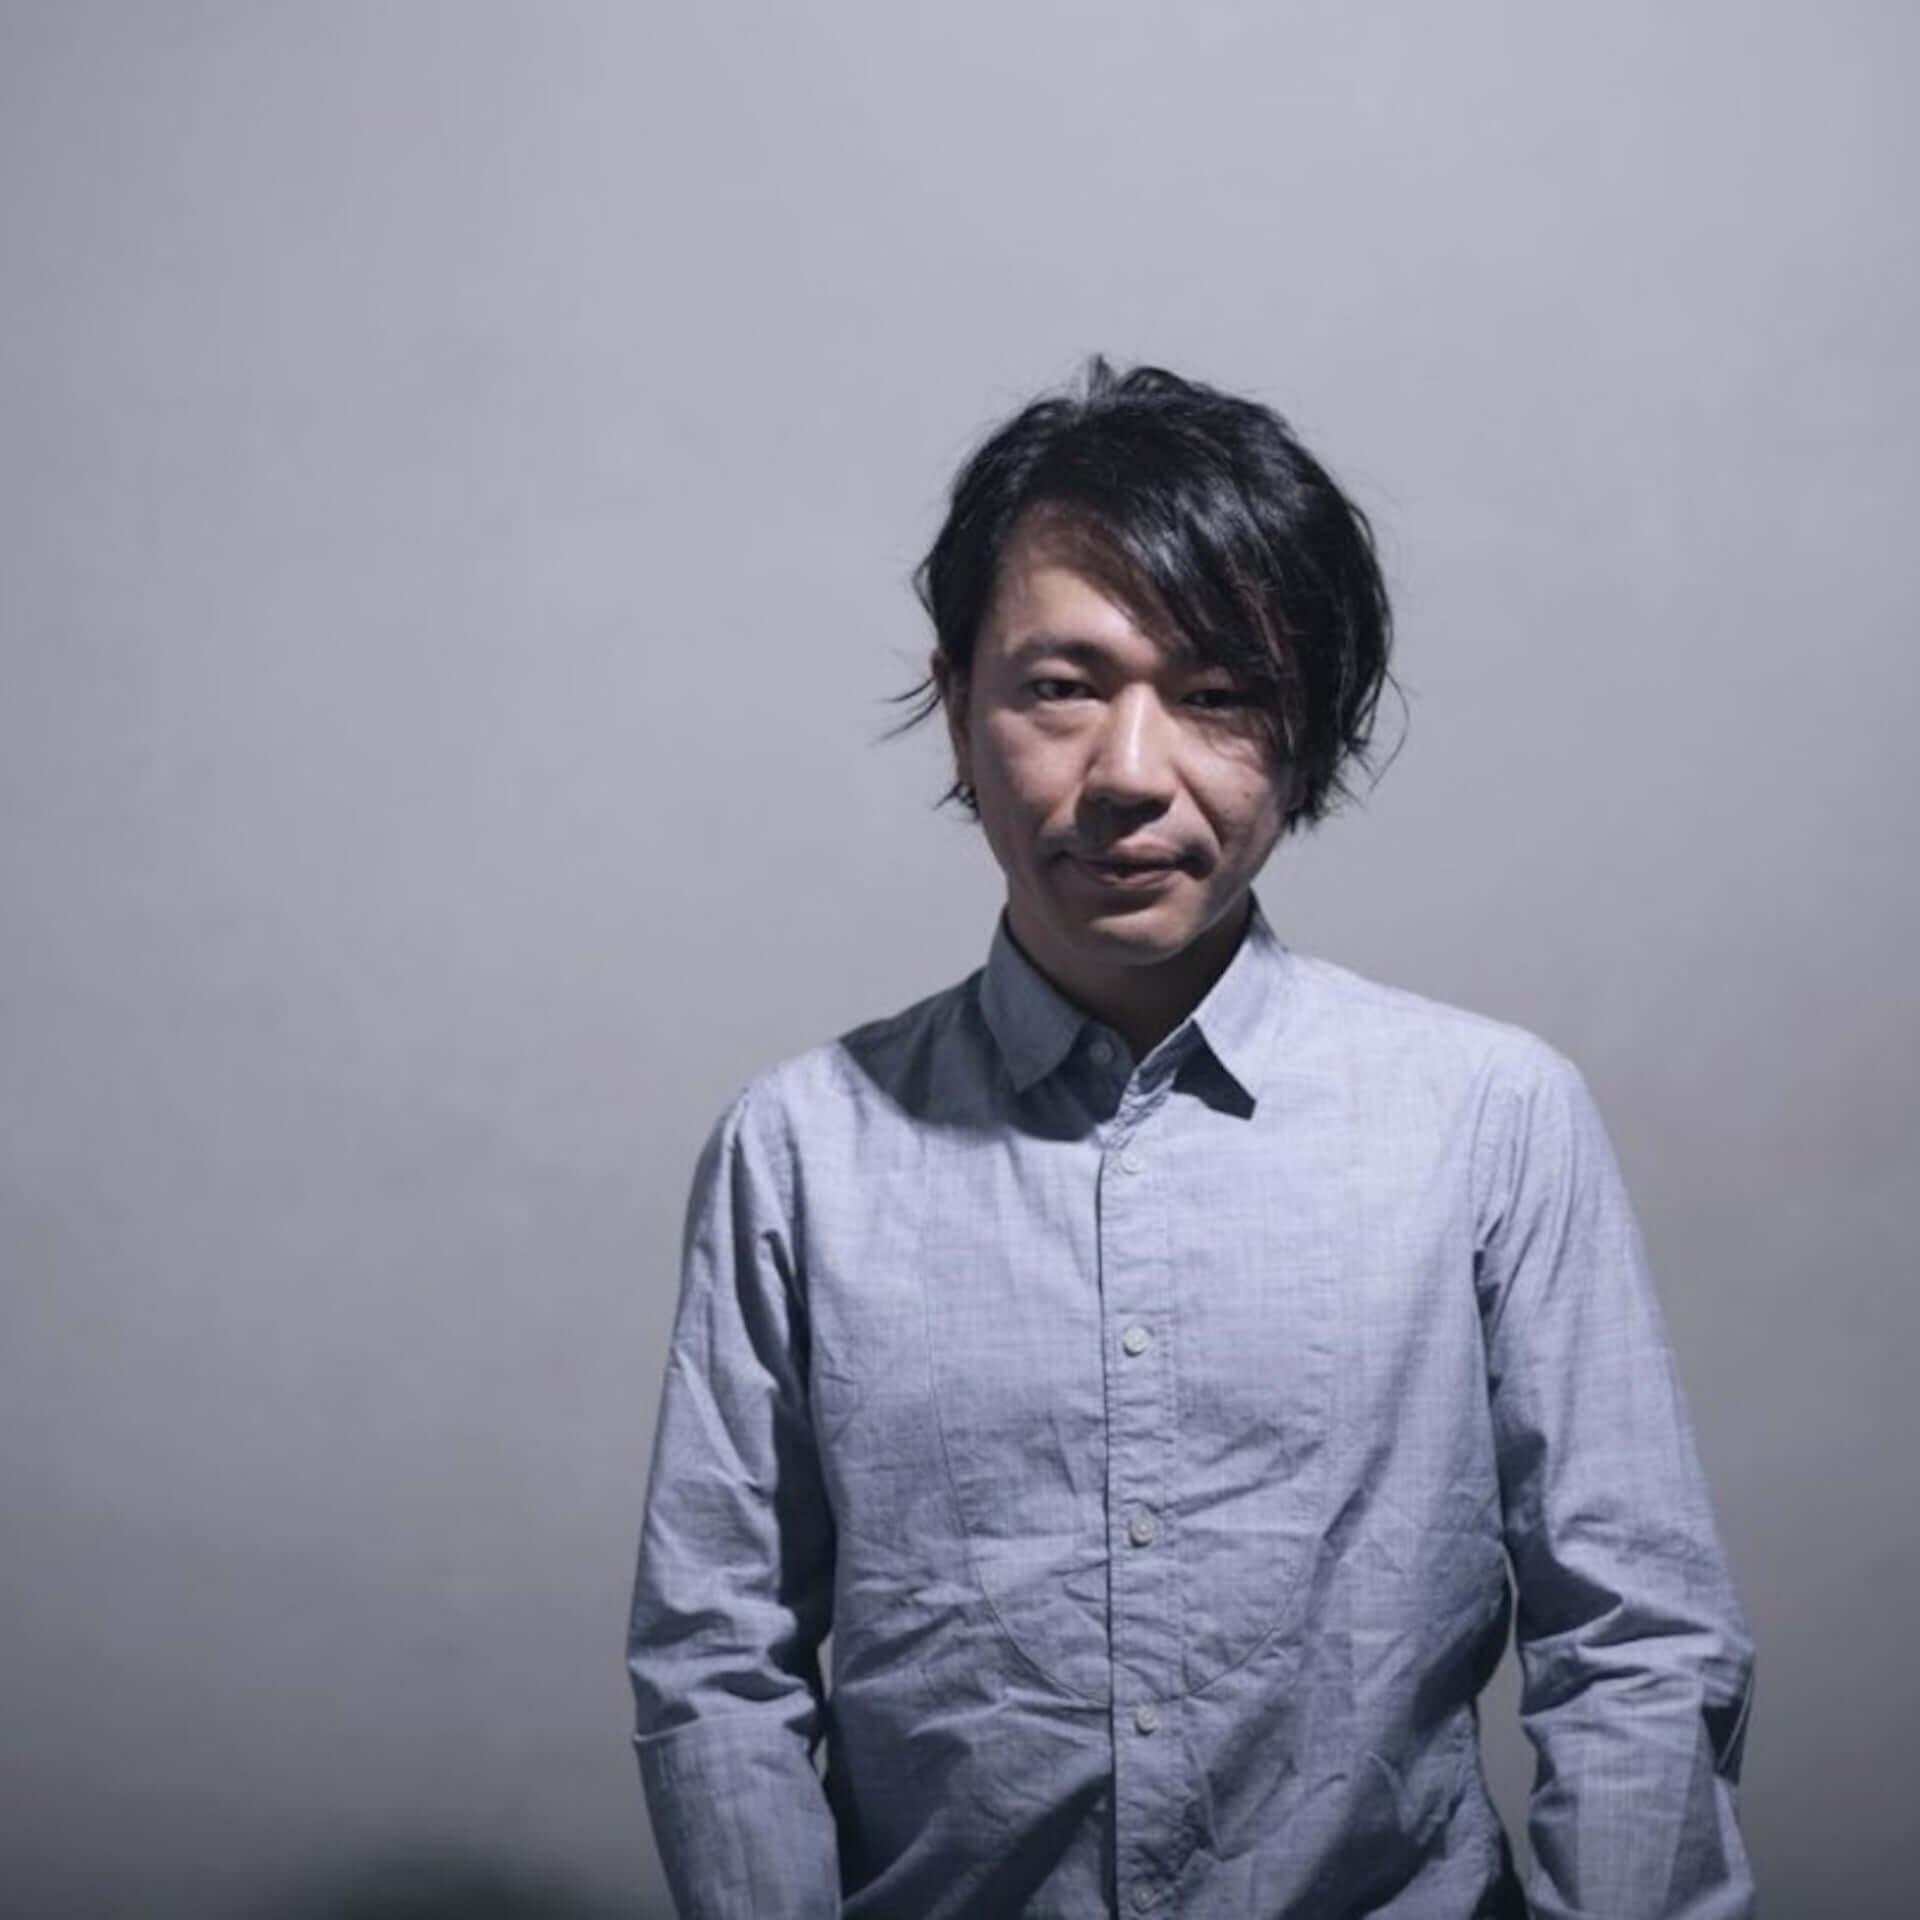 Pioneer DJ『CDJ-3000』のローンチパーティーが渋谷Contactにて明日開催!DJ Nobu、Gonno、SEKITOVA、okadadaらが出演 music201029_contact-cdj3000_2-1920x1920